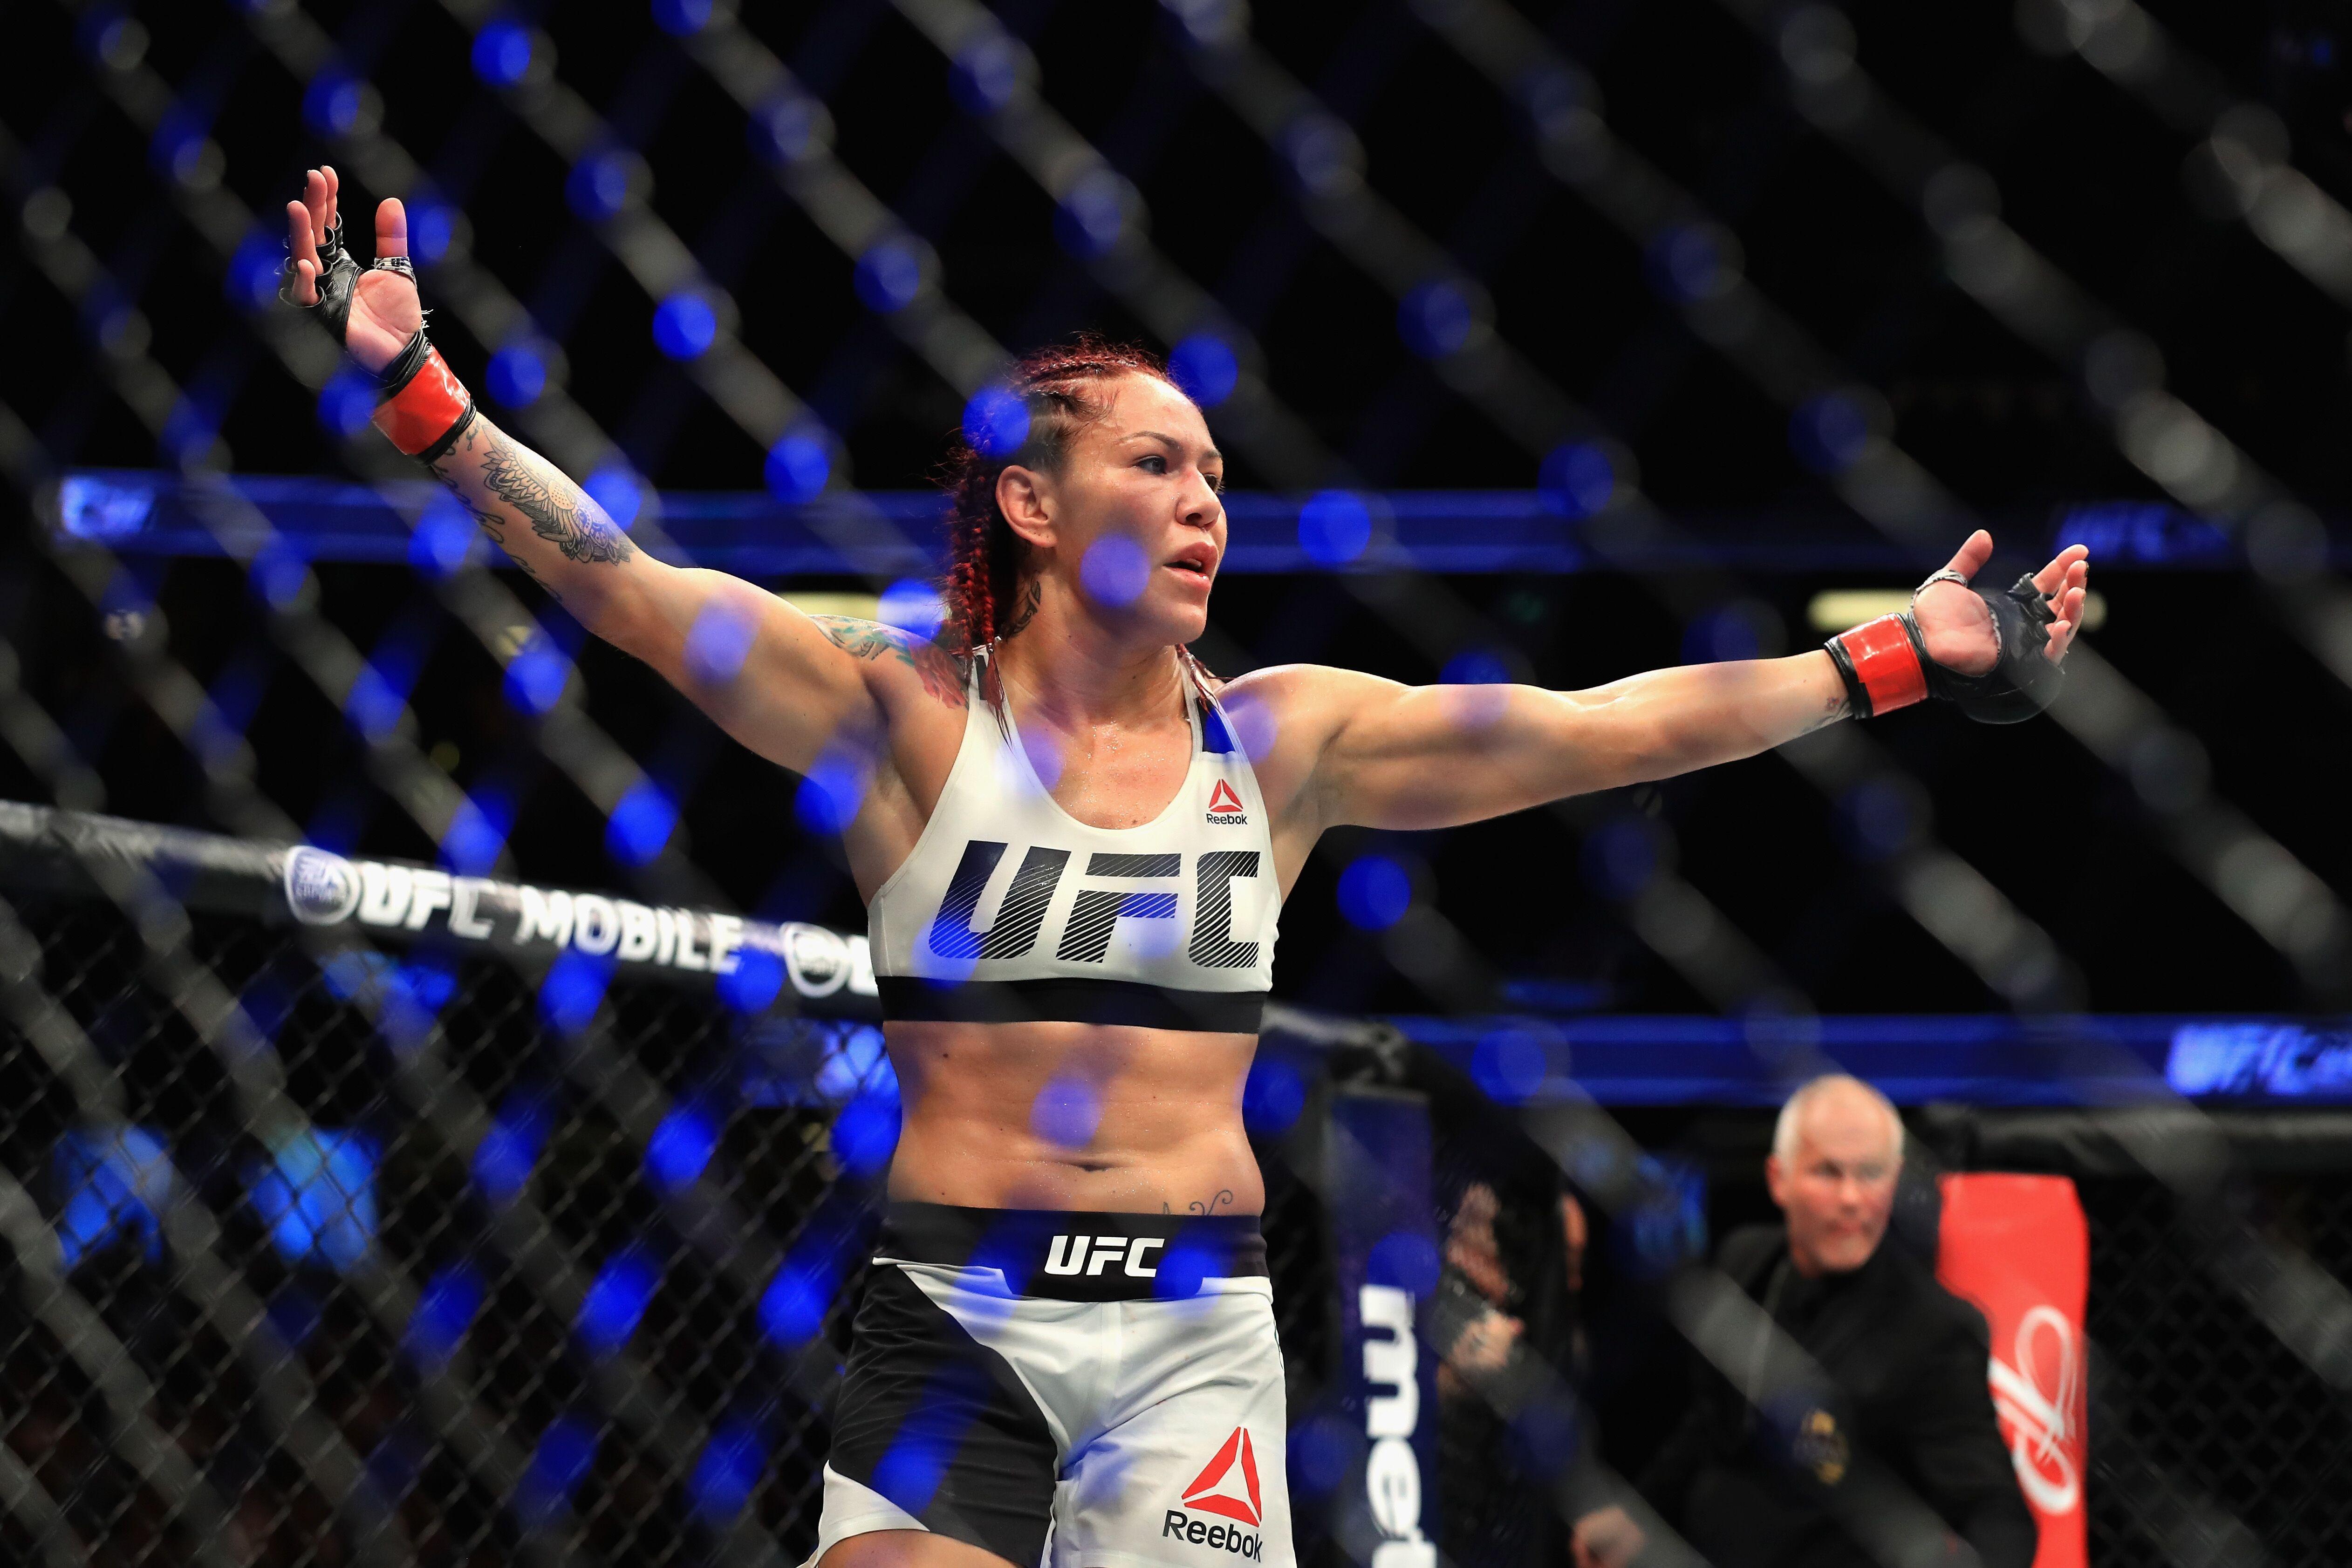 UFC 214: Cris Cyborg finishes Tonya Evinger to win title